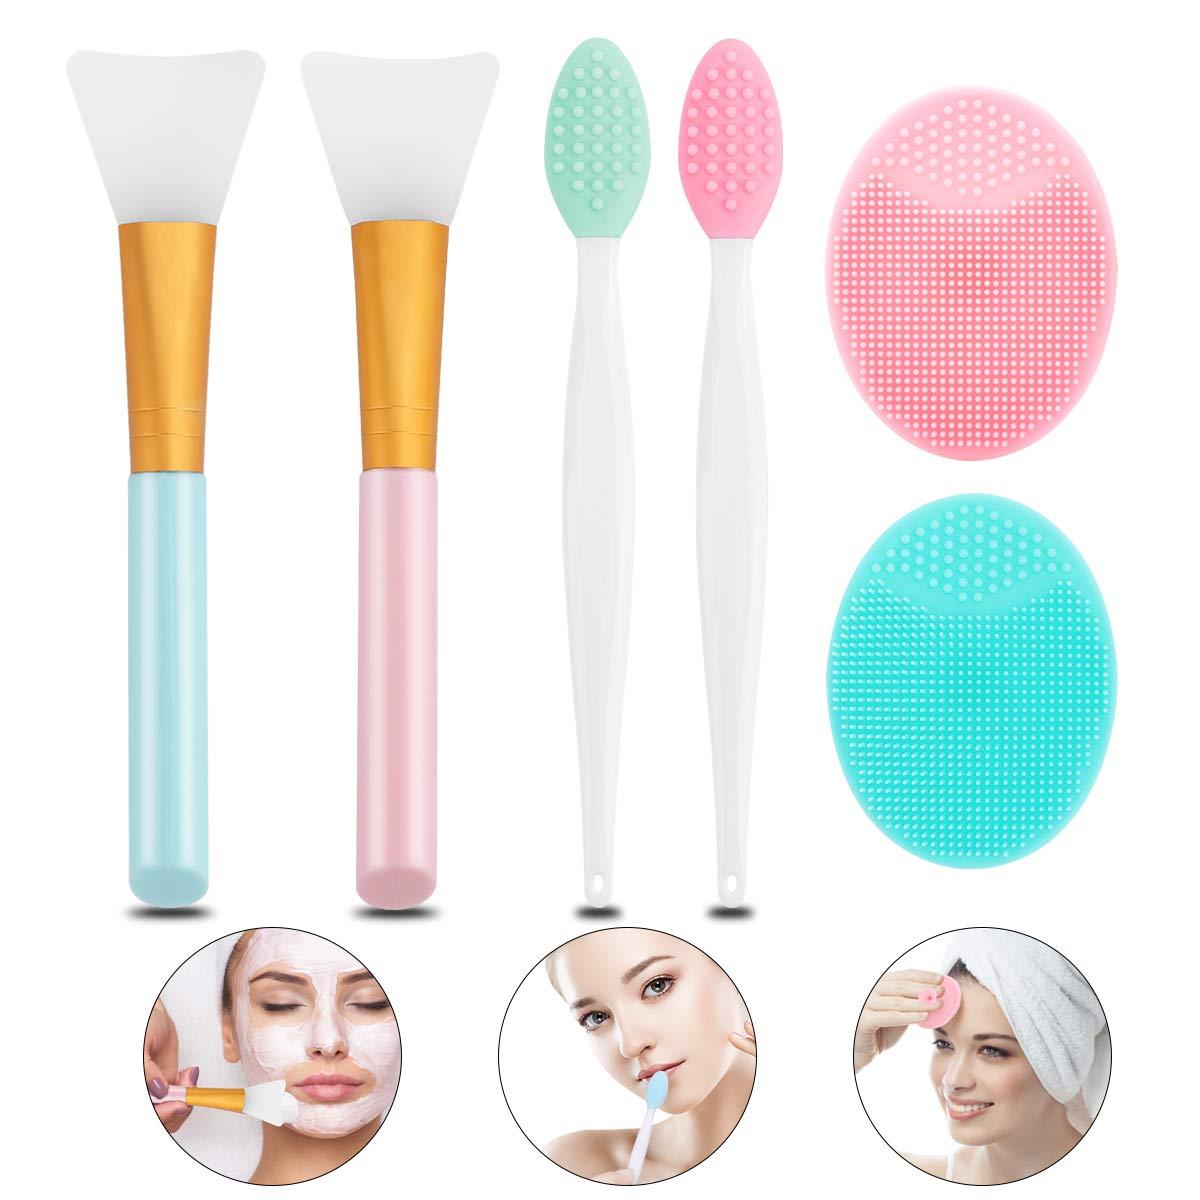 Lip Scrub Brush - LIONVISON 2pcs Silicone Exfoliating Lip Brush, 2pcs Silicone Face Mask Brush Soft Facial Mud Mask Applicator Brush and 2pcs Silicone Face Scrubbers Exfoliator Brush